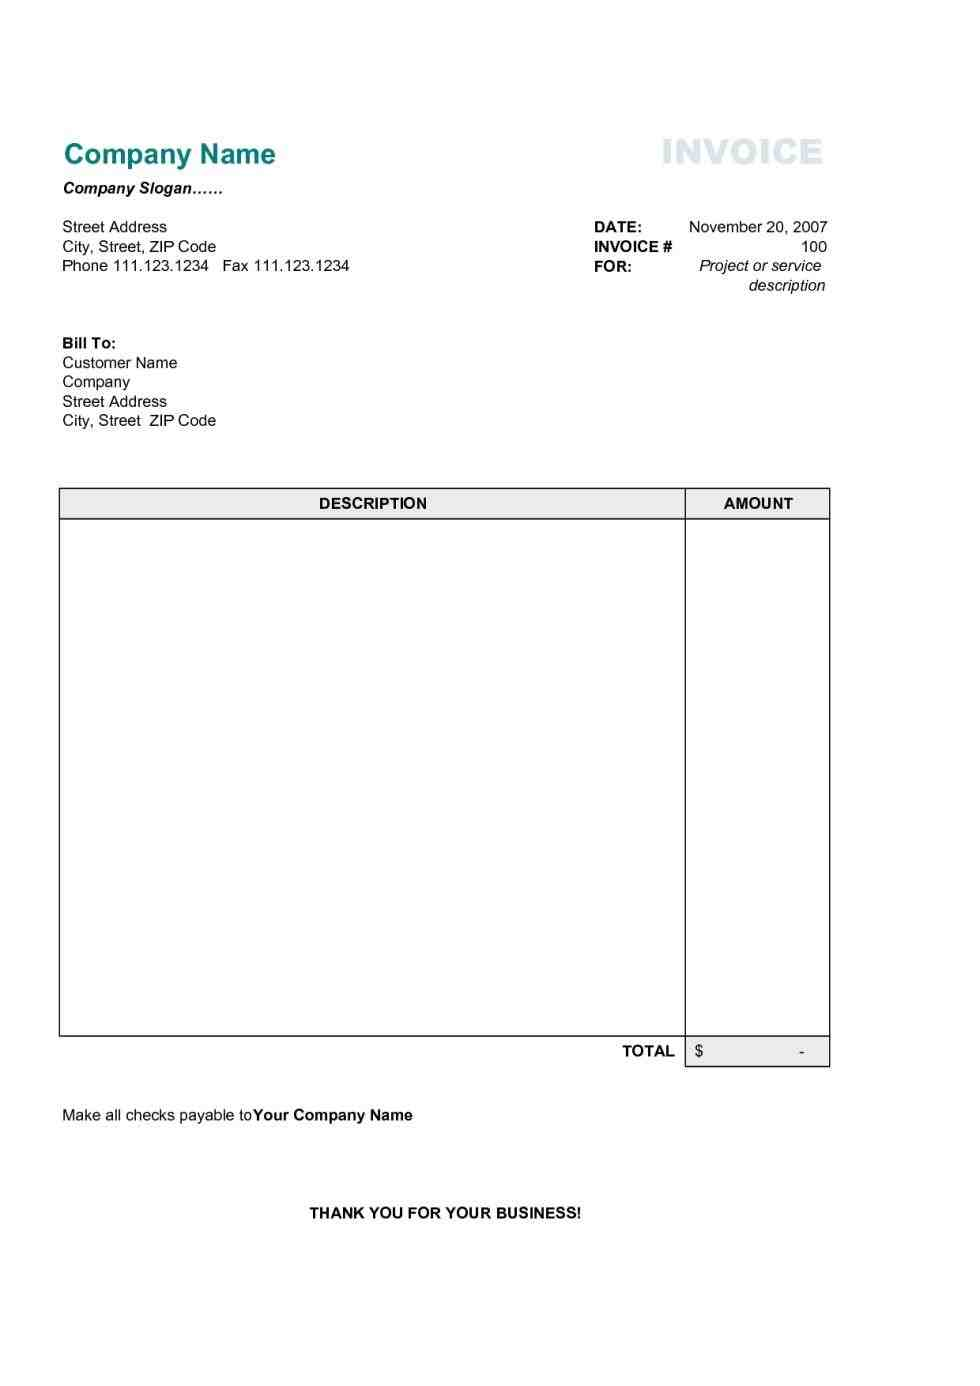 Template Excel Australia template australia ideasrhsimpleinvoicenet australian excel kylse new gst tax rhexceltemplateus australian Invoice Template Excel Australia invoice template excel